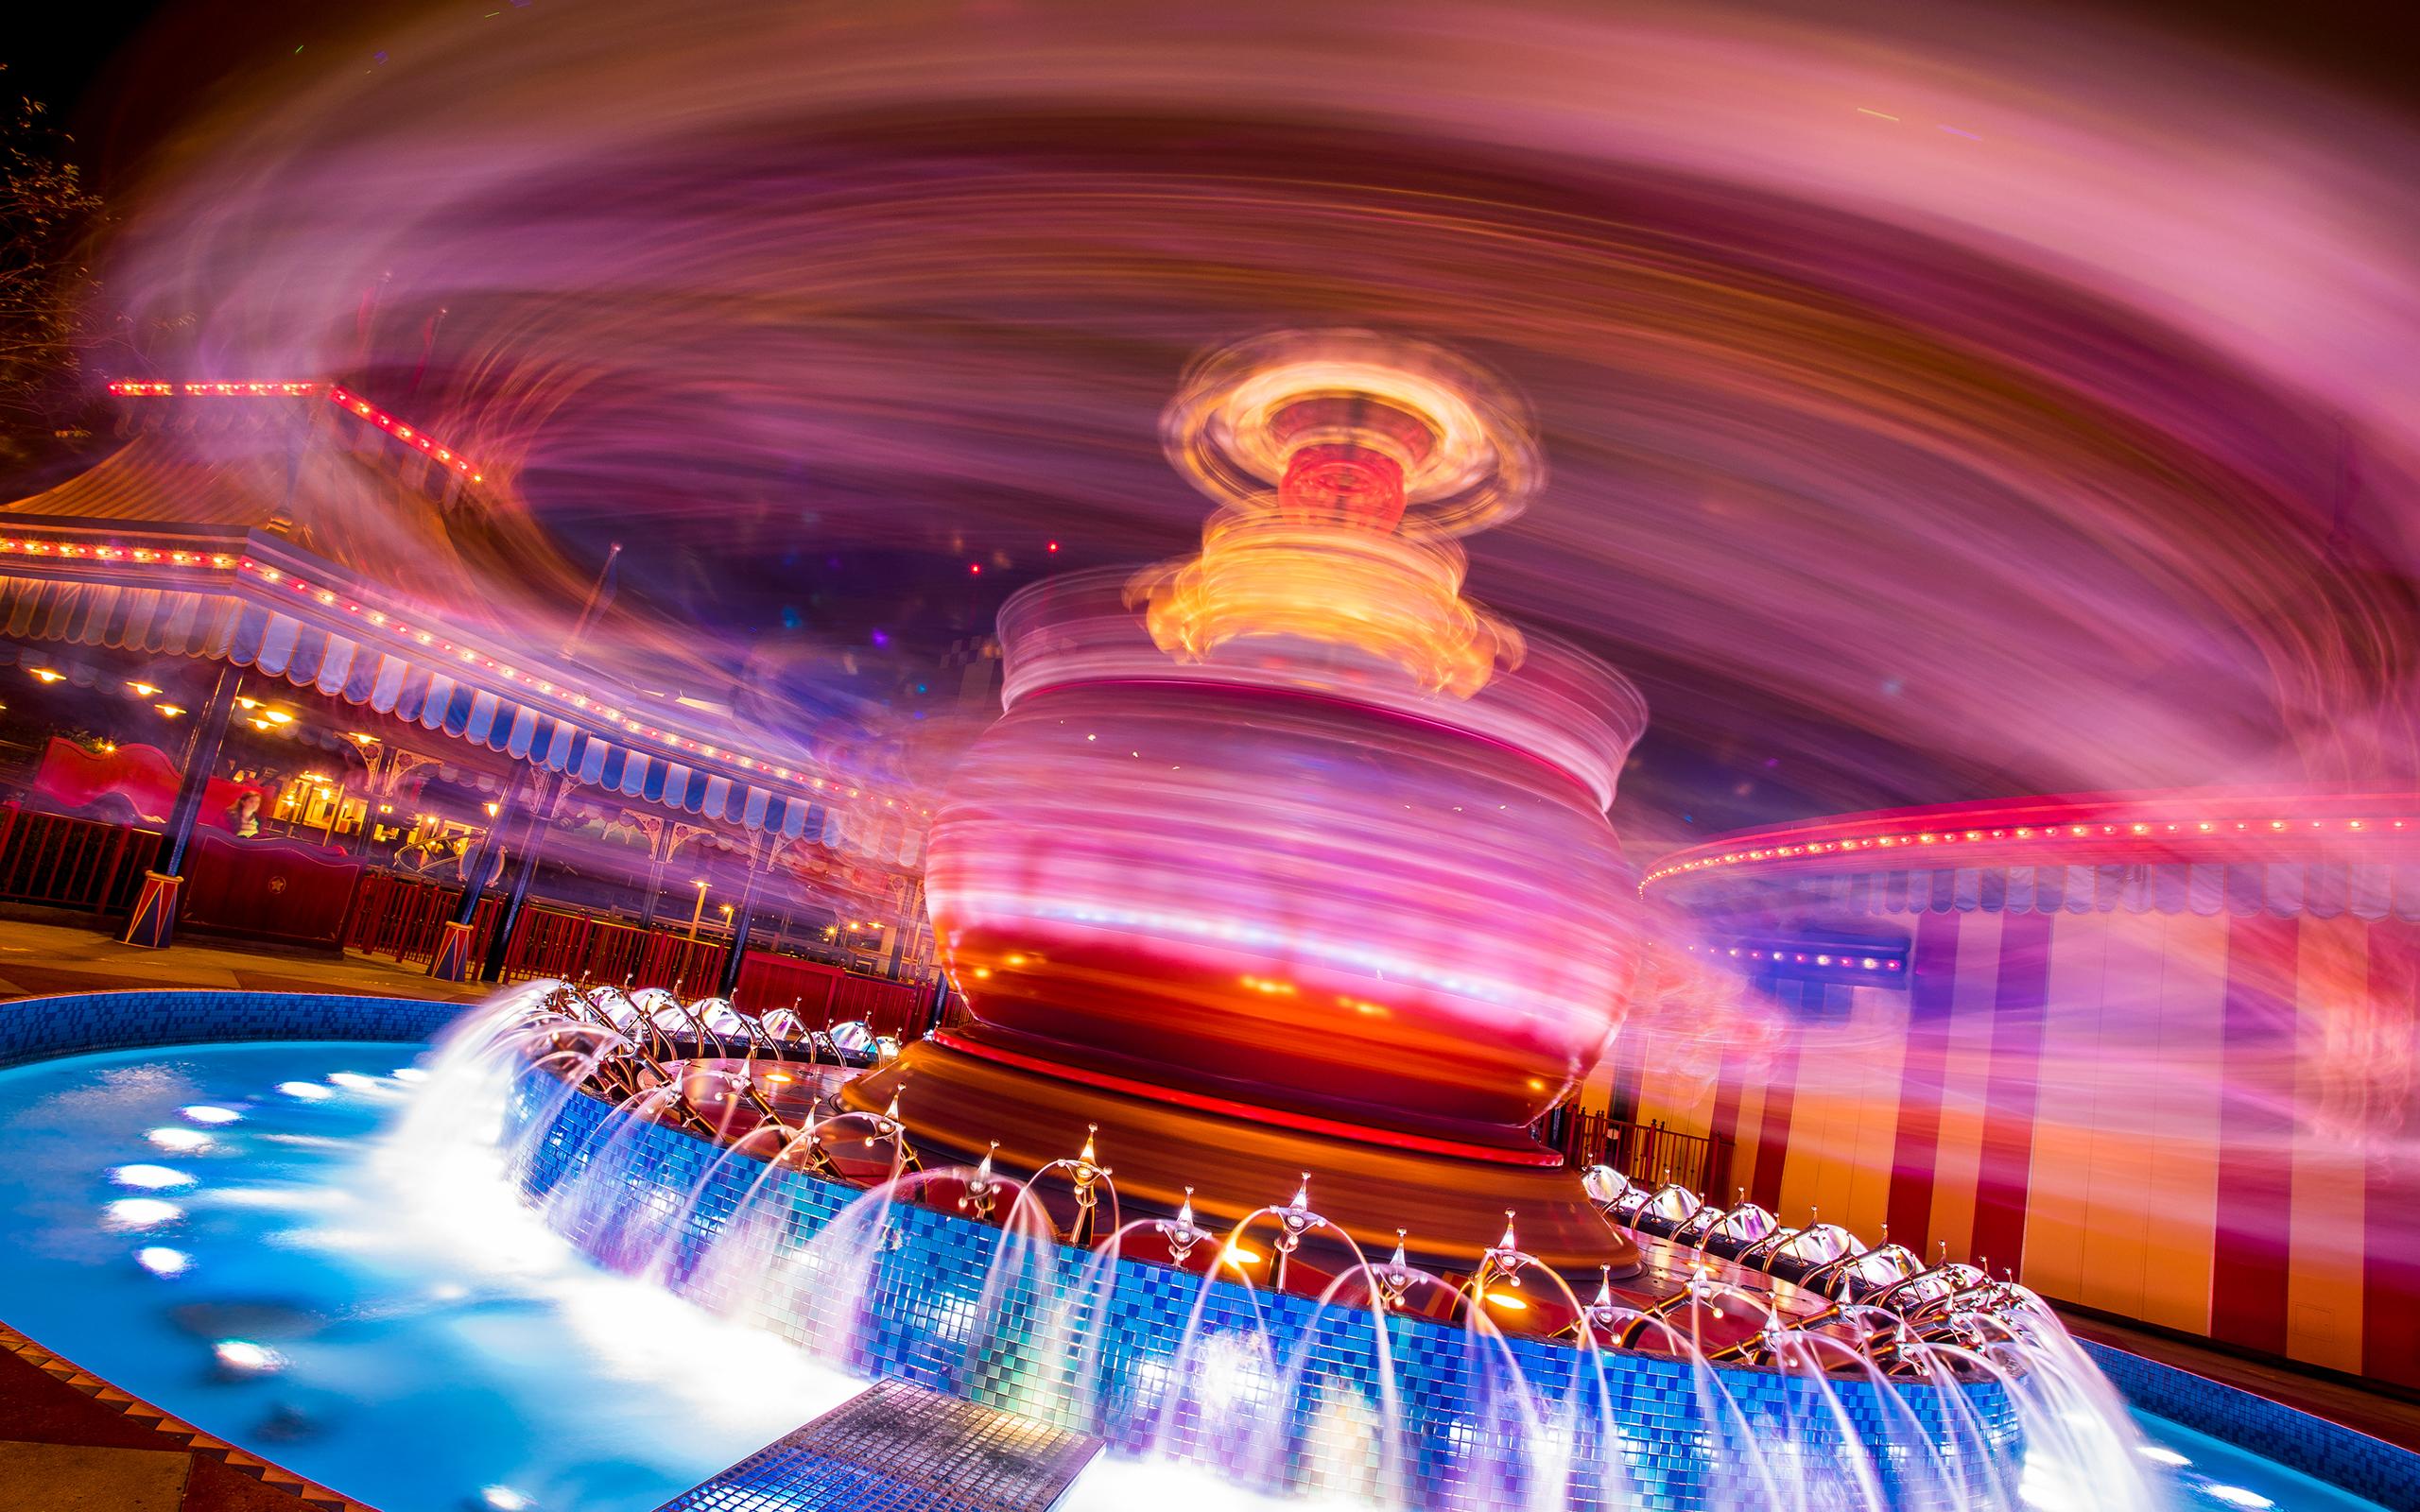 Motion Blur Wallpaper